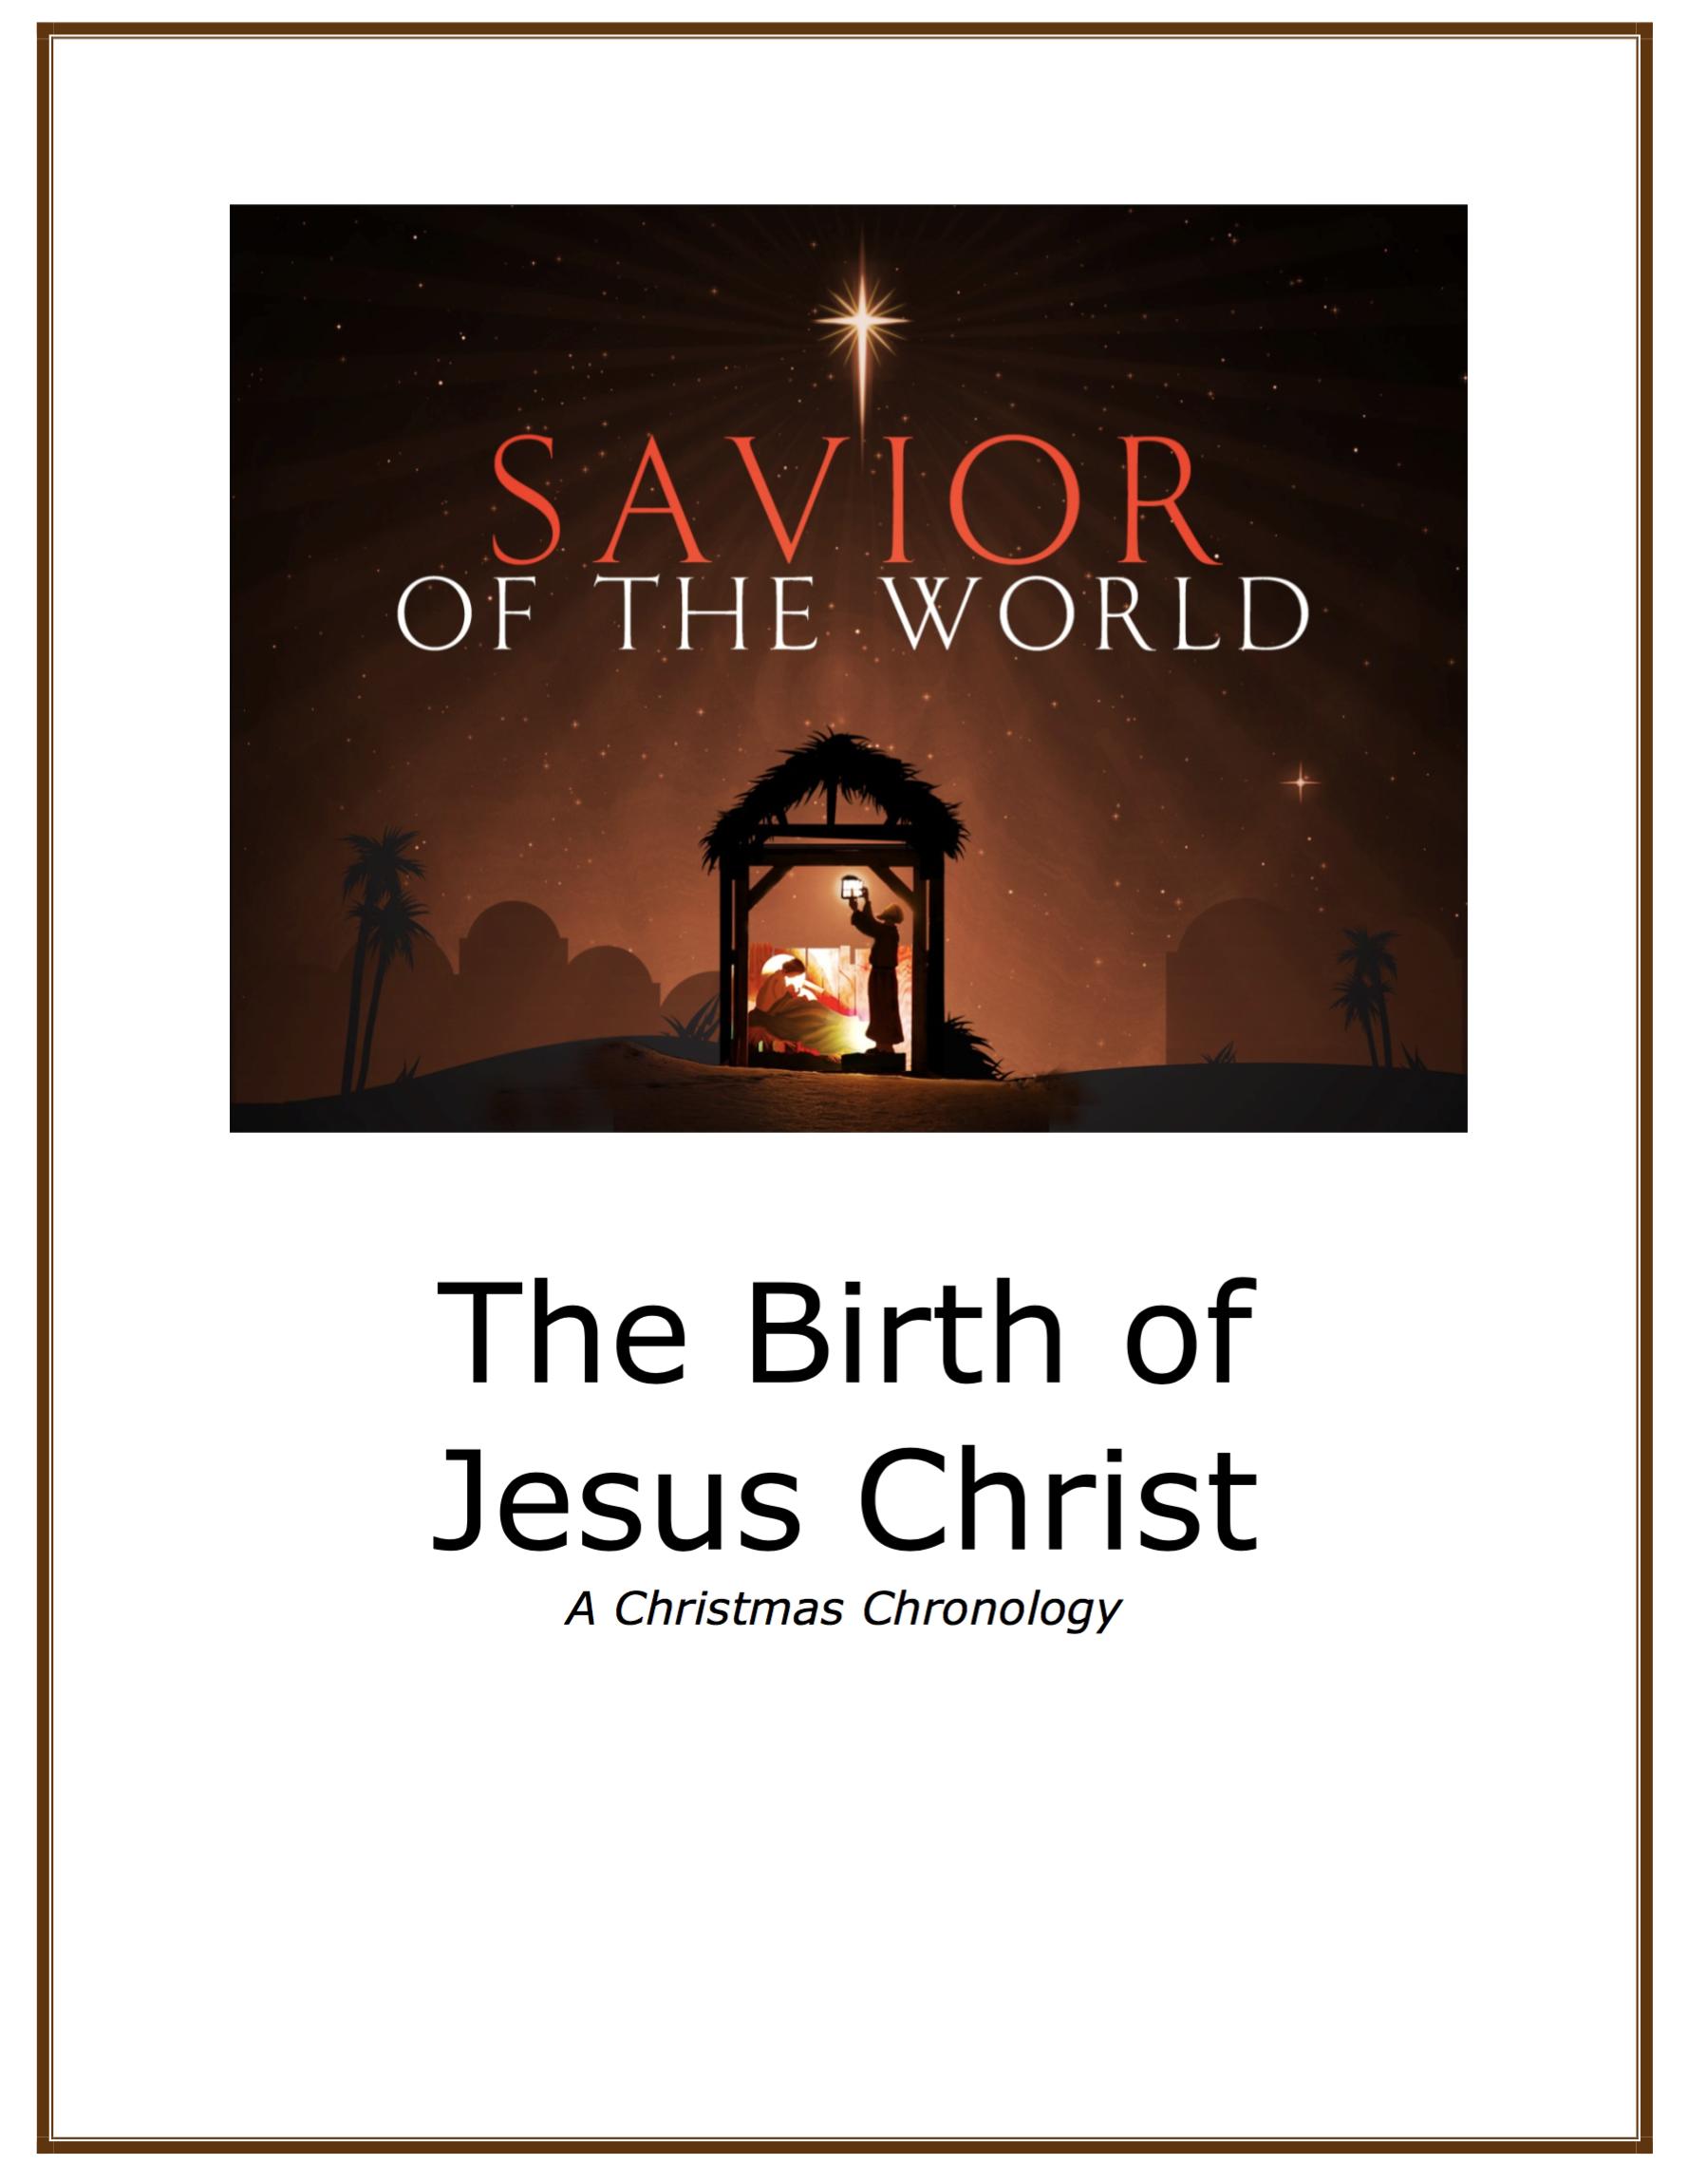 Christmas chronology icon2